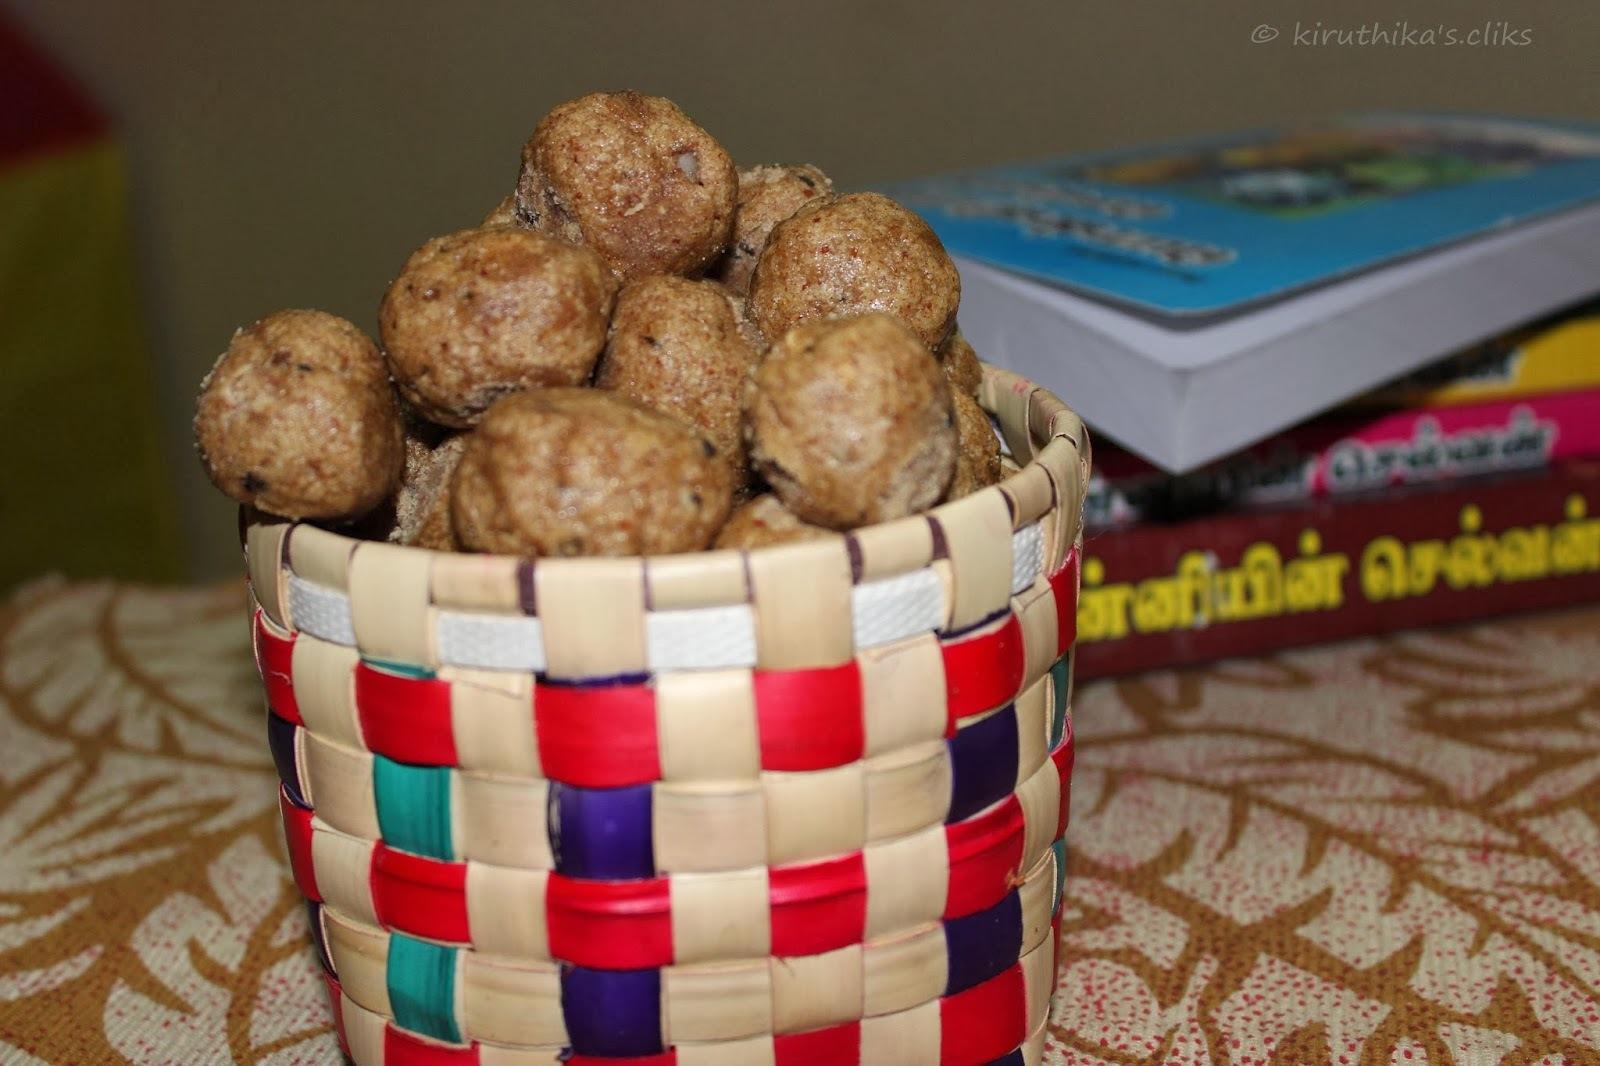 Sathu Maavu Kozhukattai / Nutritious Multigrain Dumpling